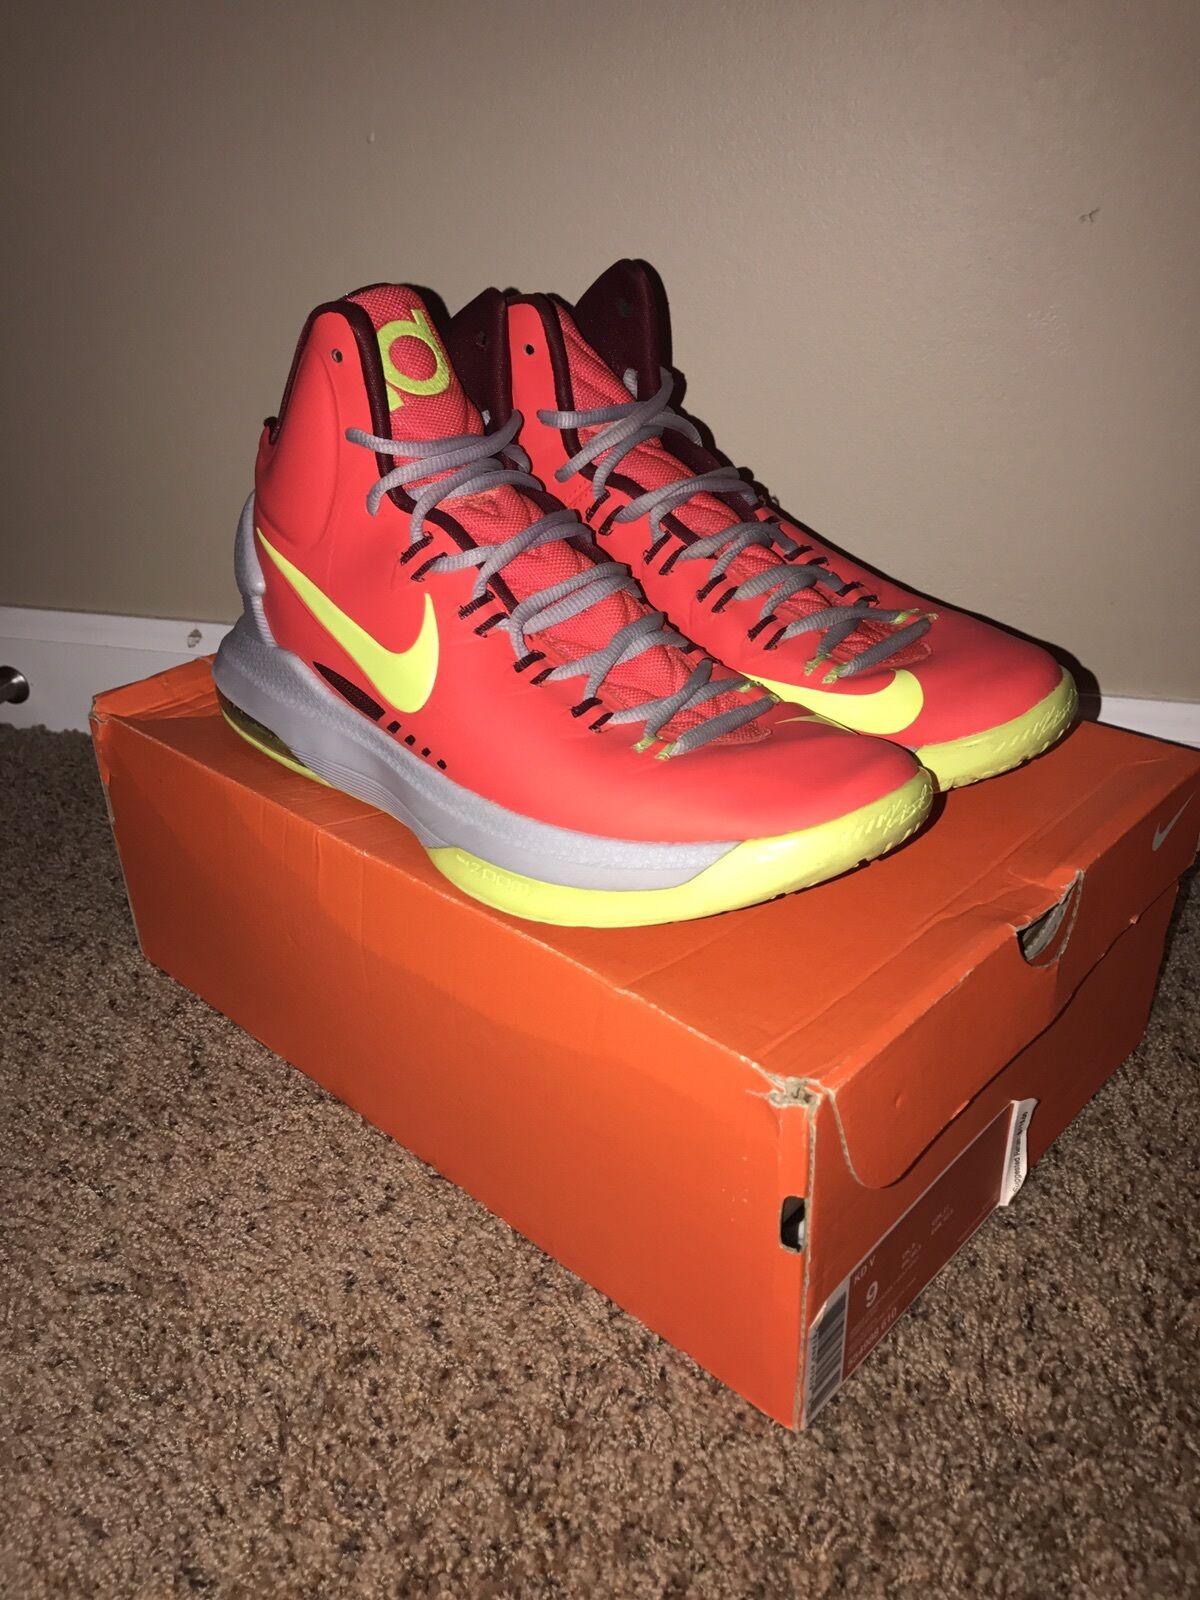 Kd 5 dmv NOT Jordan 1 2 3 4 5 6 7 8 9 10 11 12 Wild casual shoes